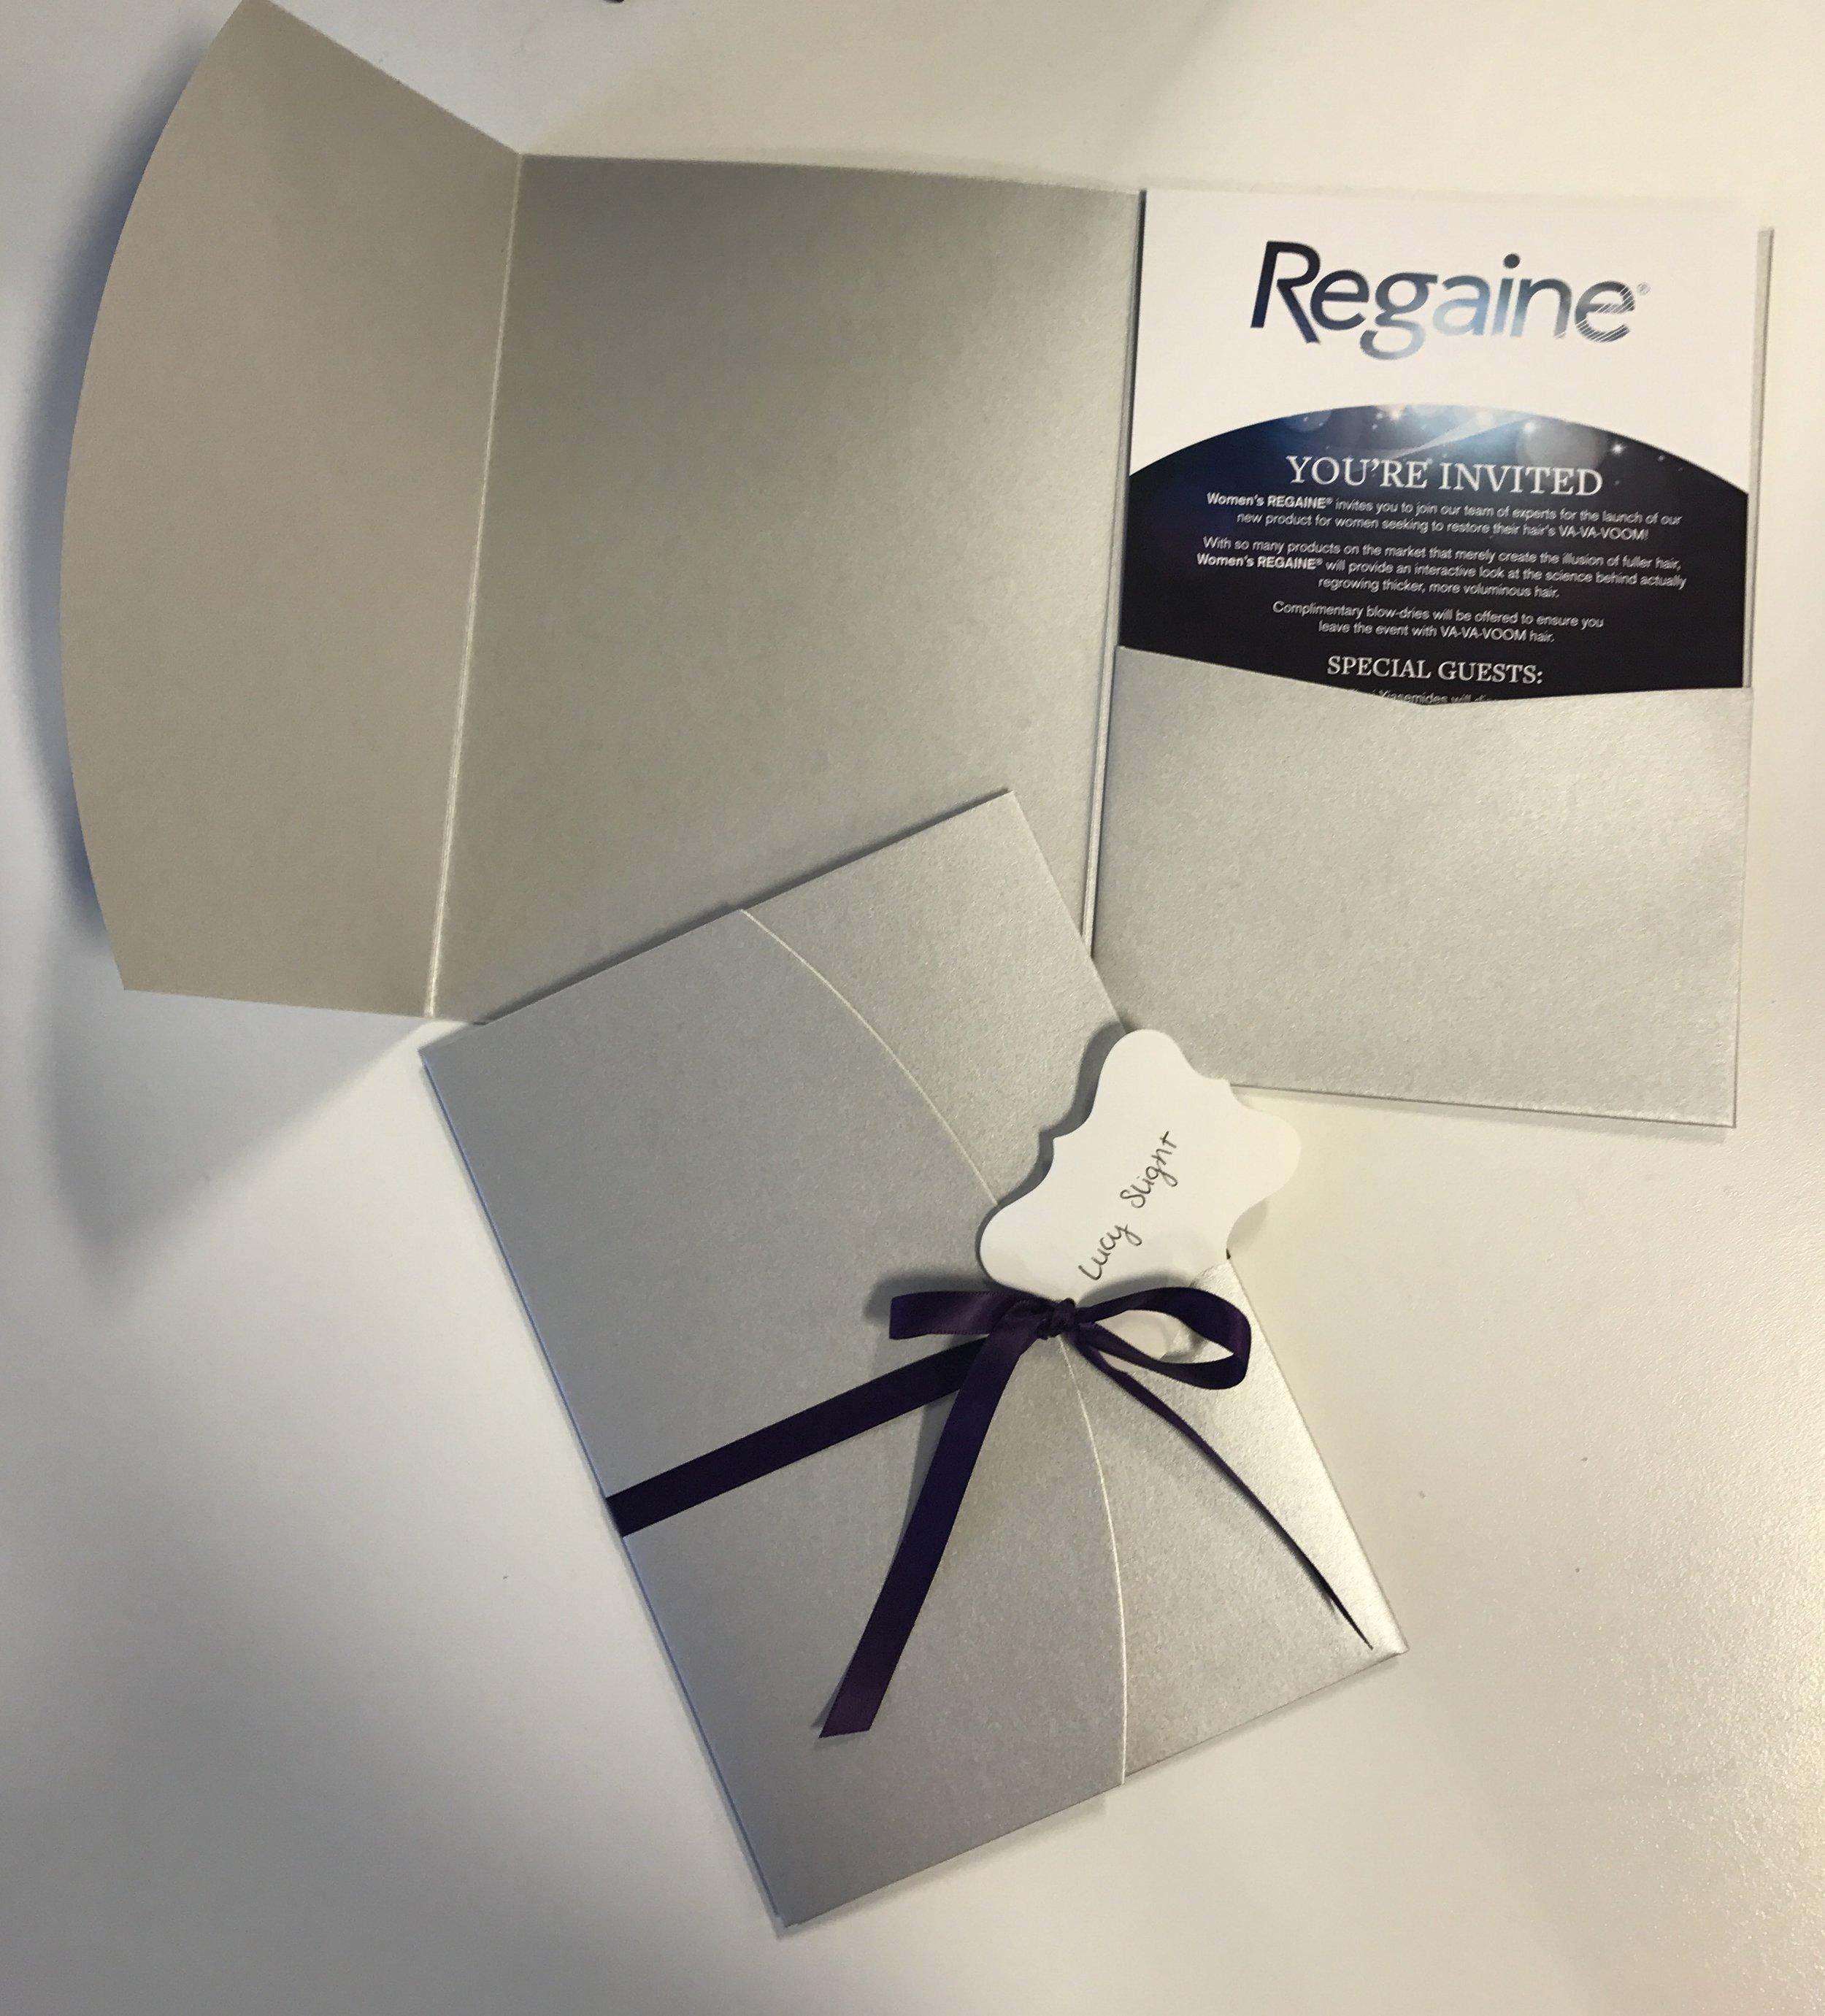 Regaine invitation.jpg